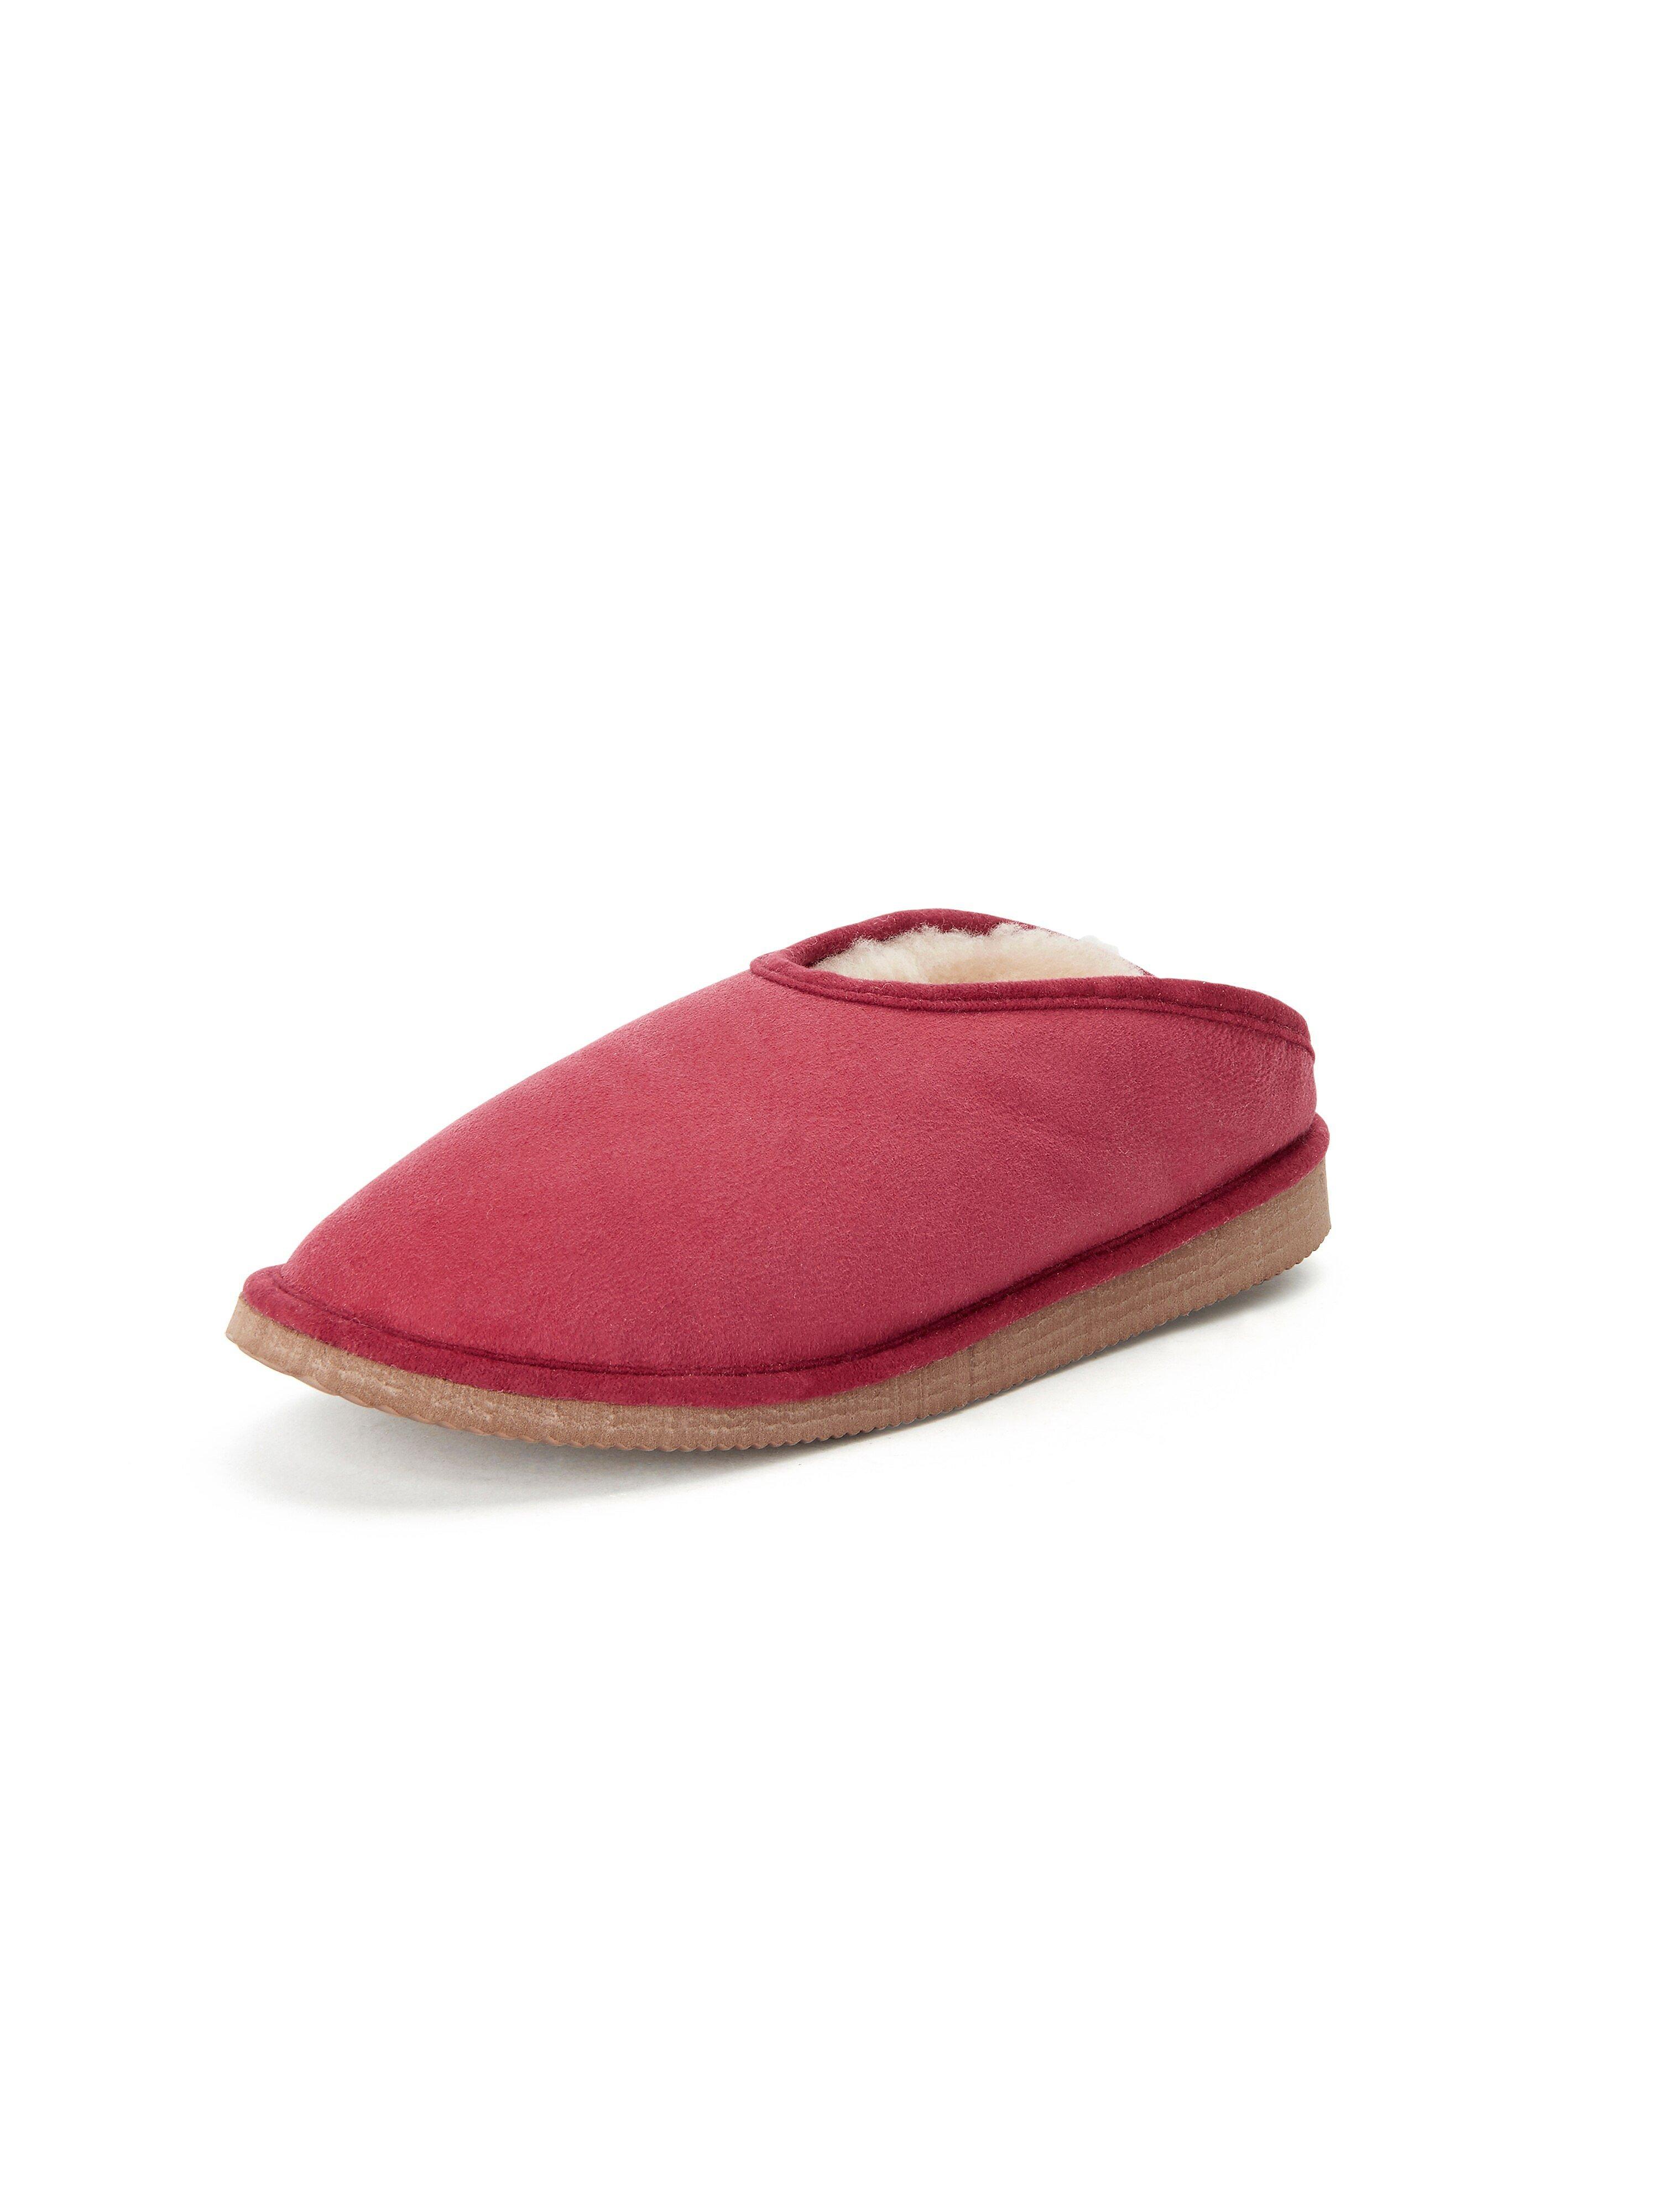 Lammy pantoffels, model Fatima Van Kitzpichler rood